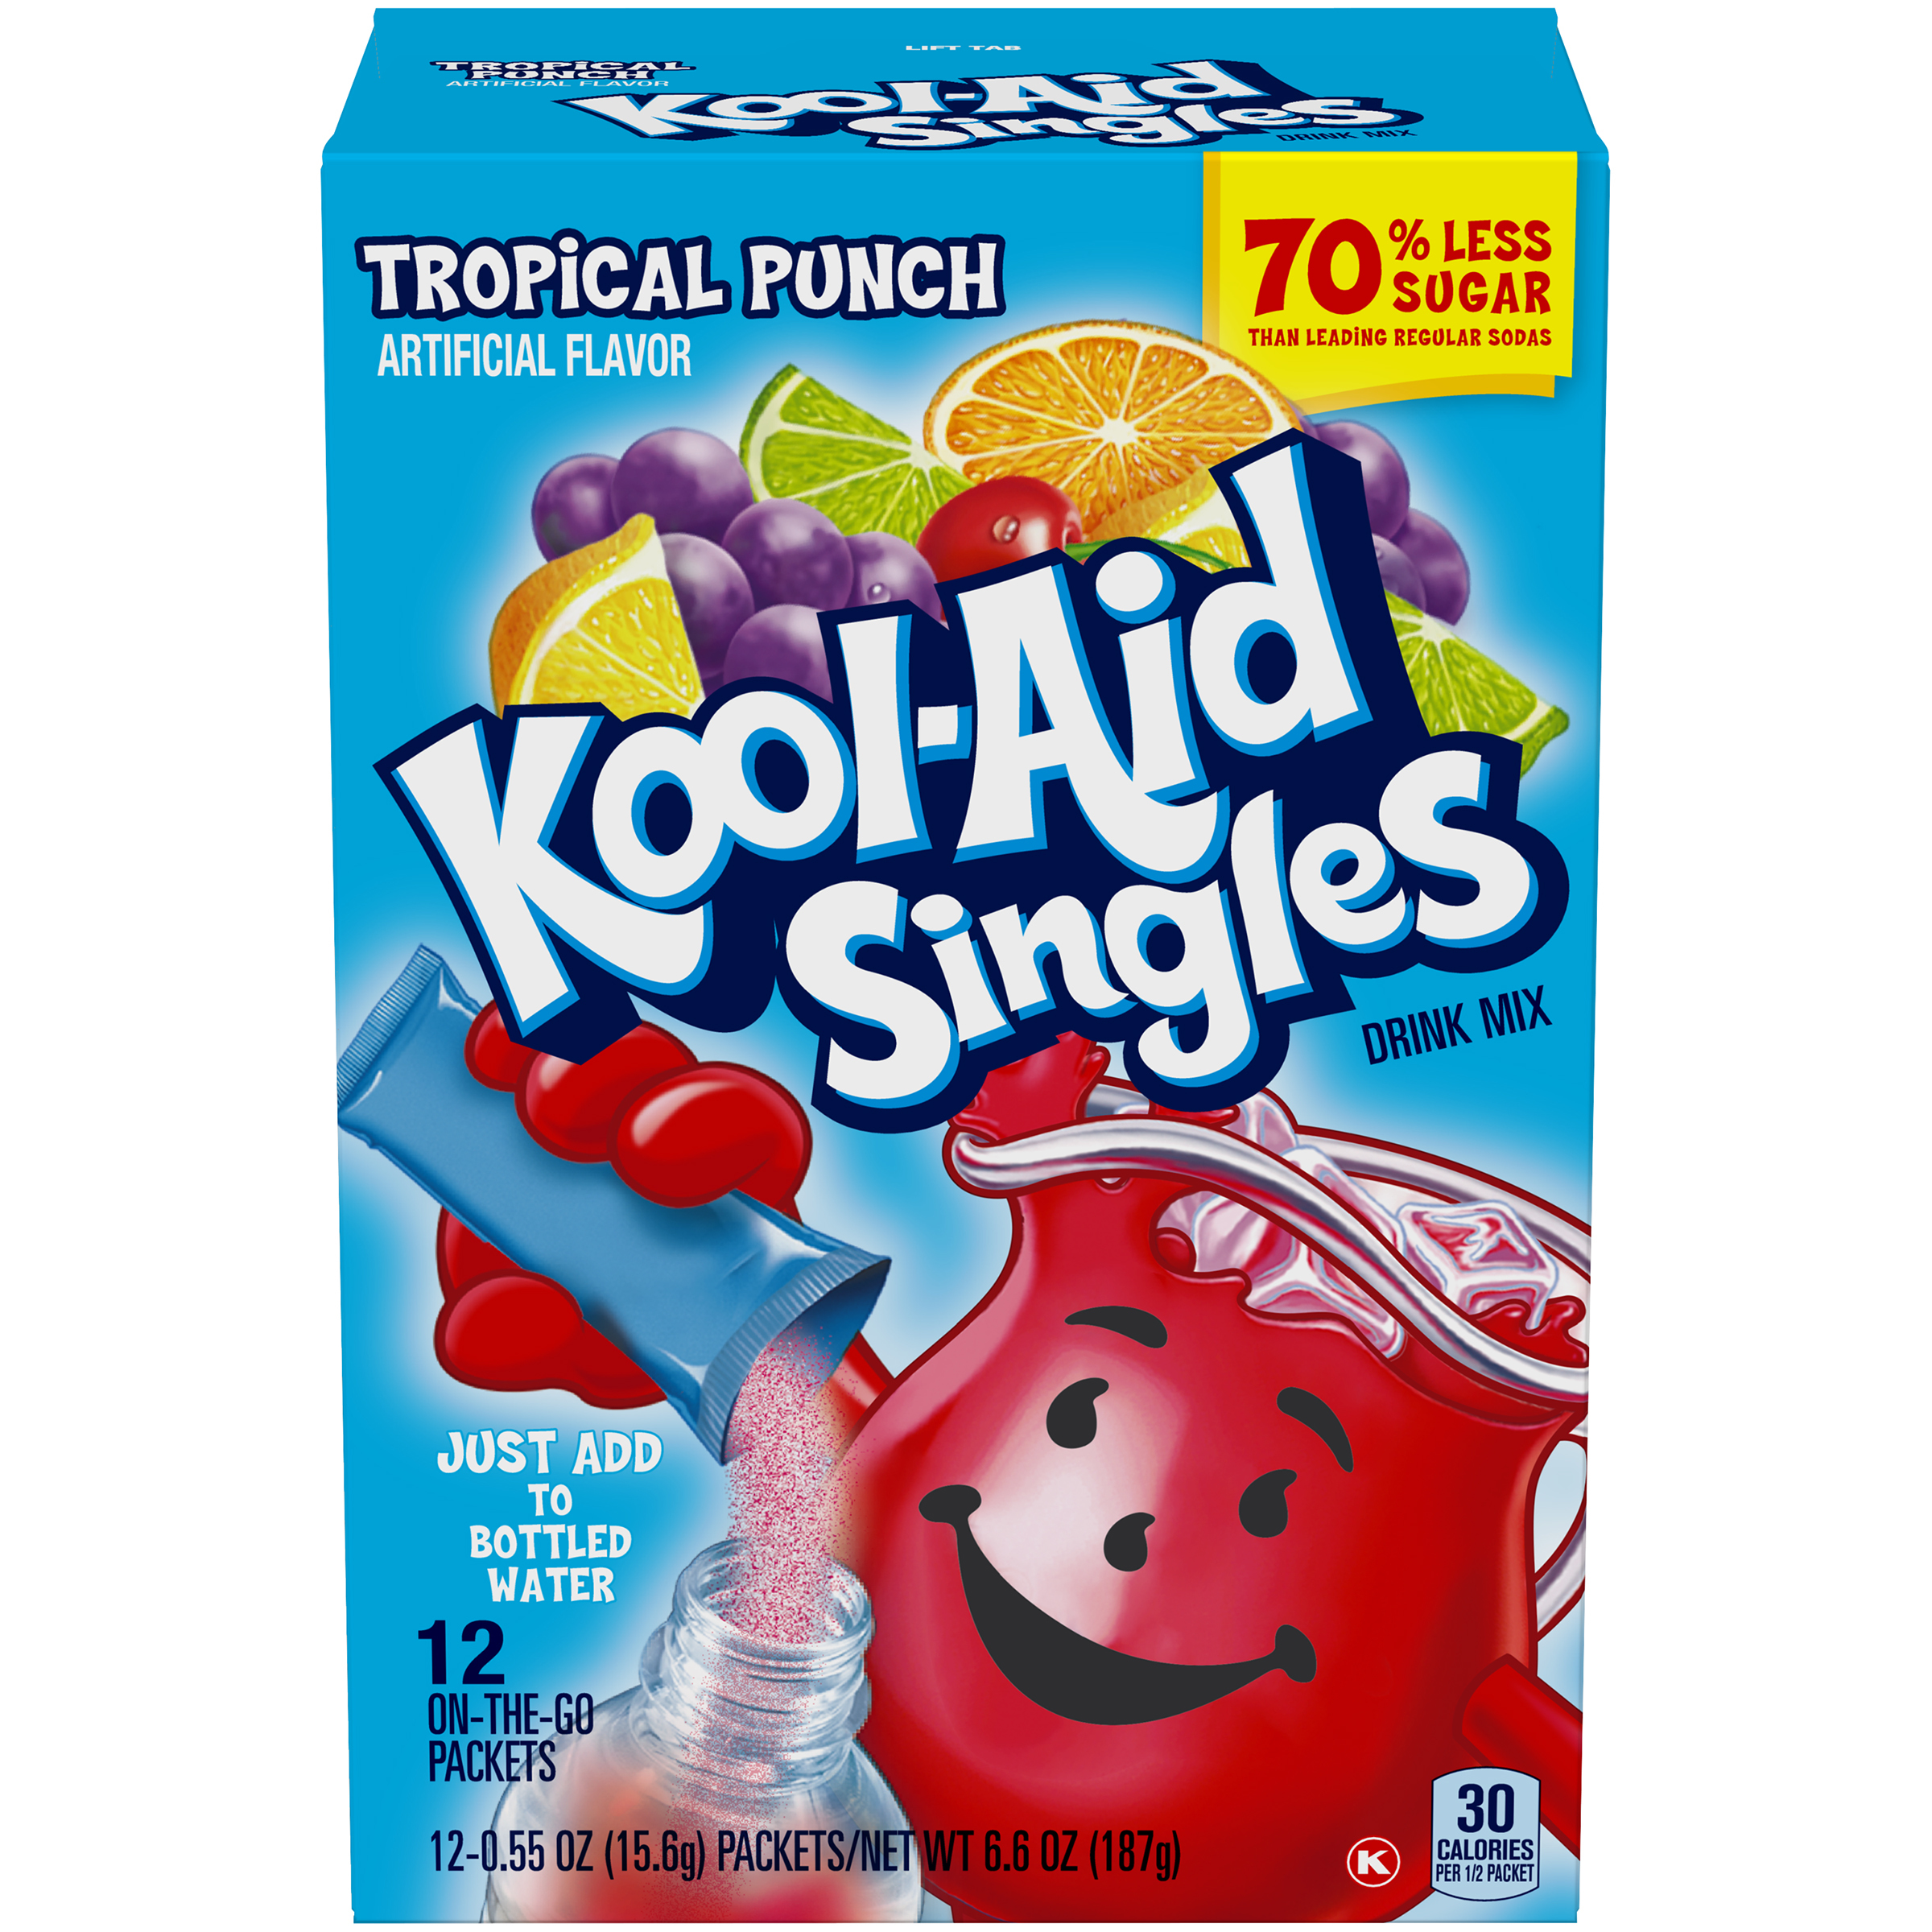 Kool-Aid Singles Tropical Punch 12 Ct Soft Drink Mix 6.6 Oz Box image